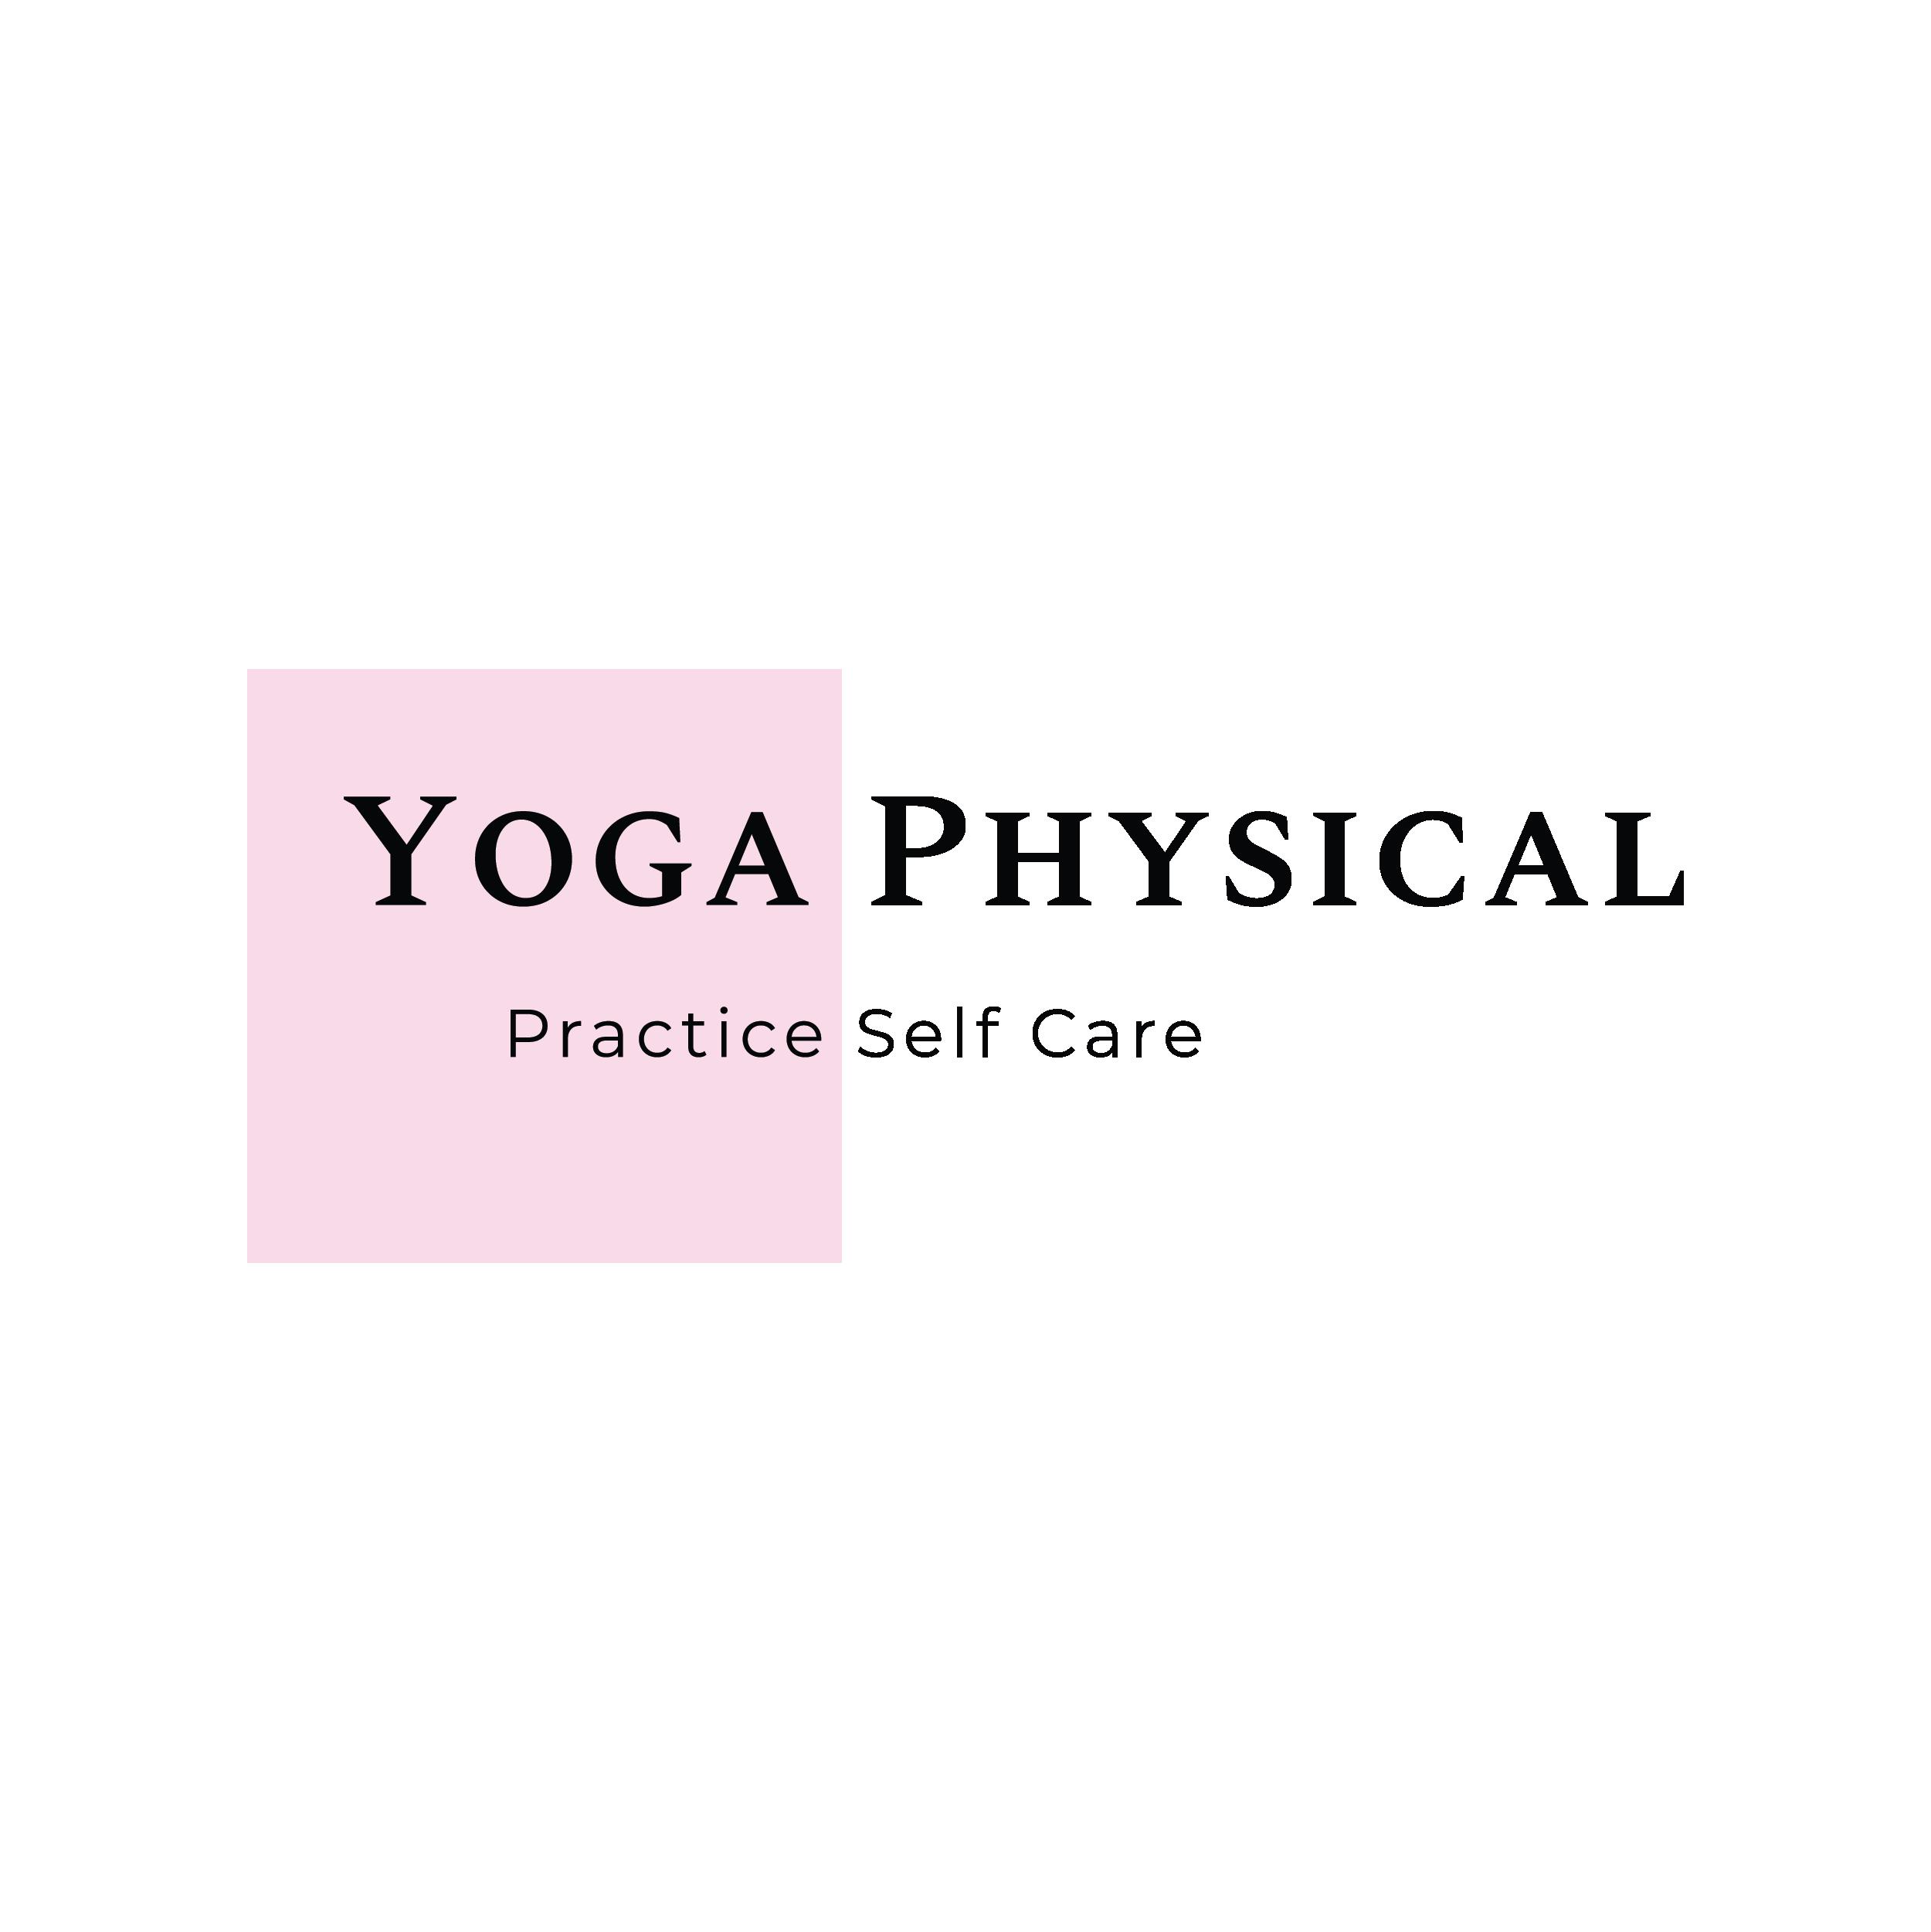 Yoga Physical